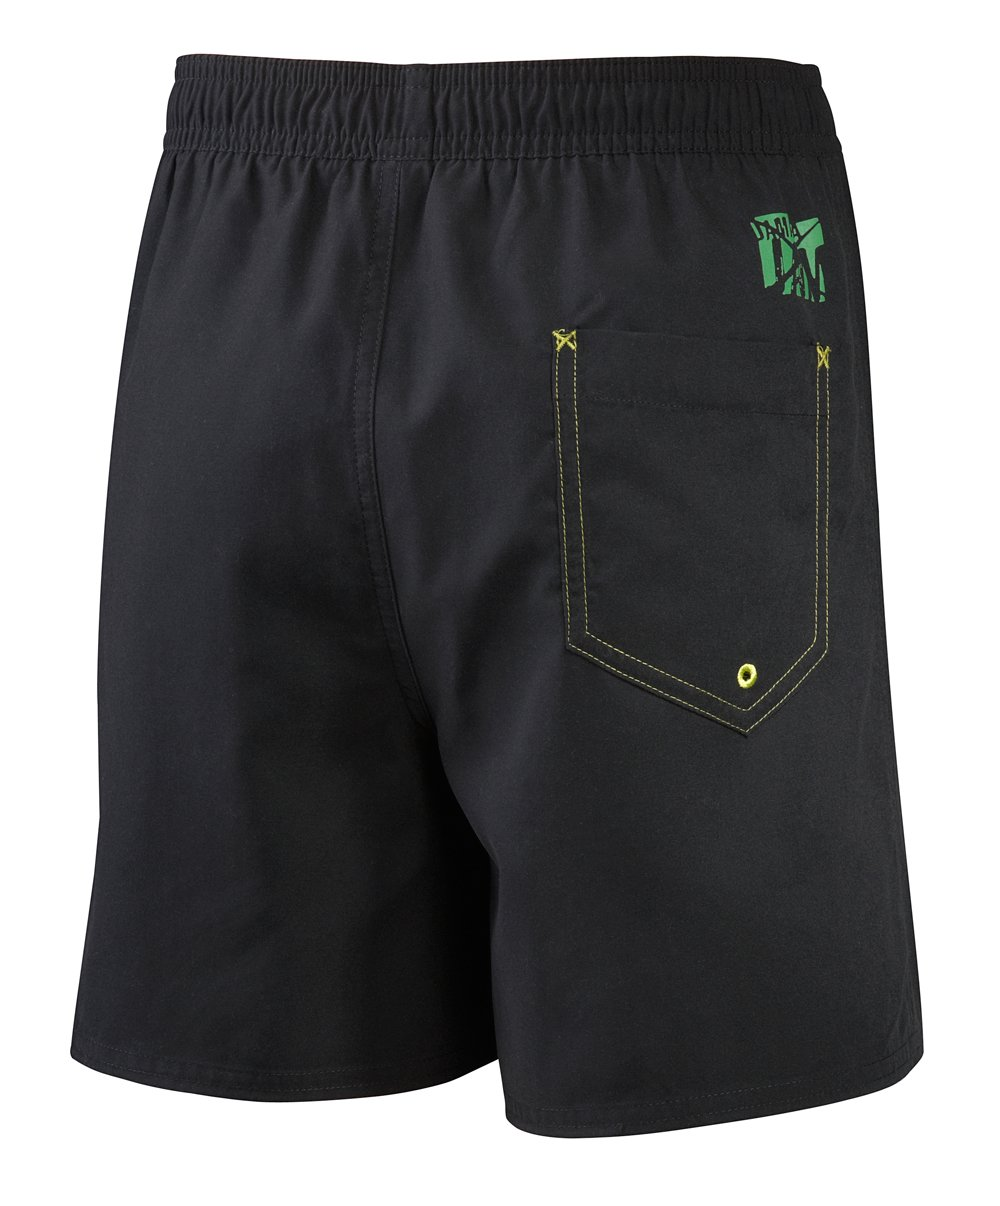 Puma Pantalones Cortos para ni/ño